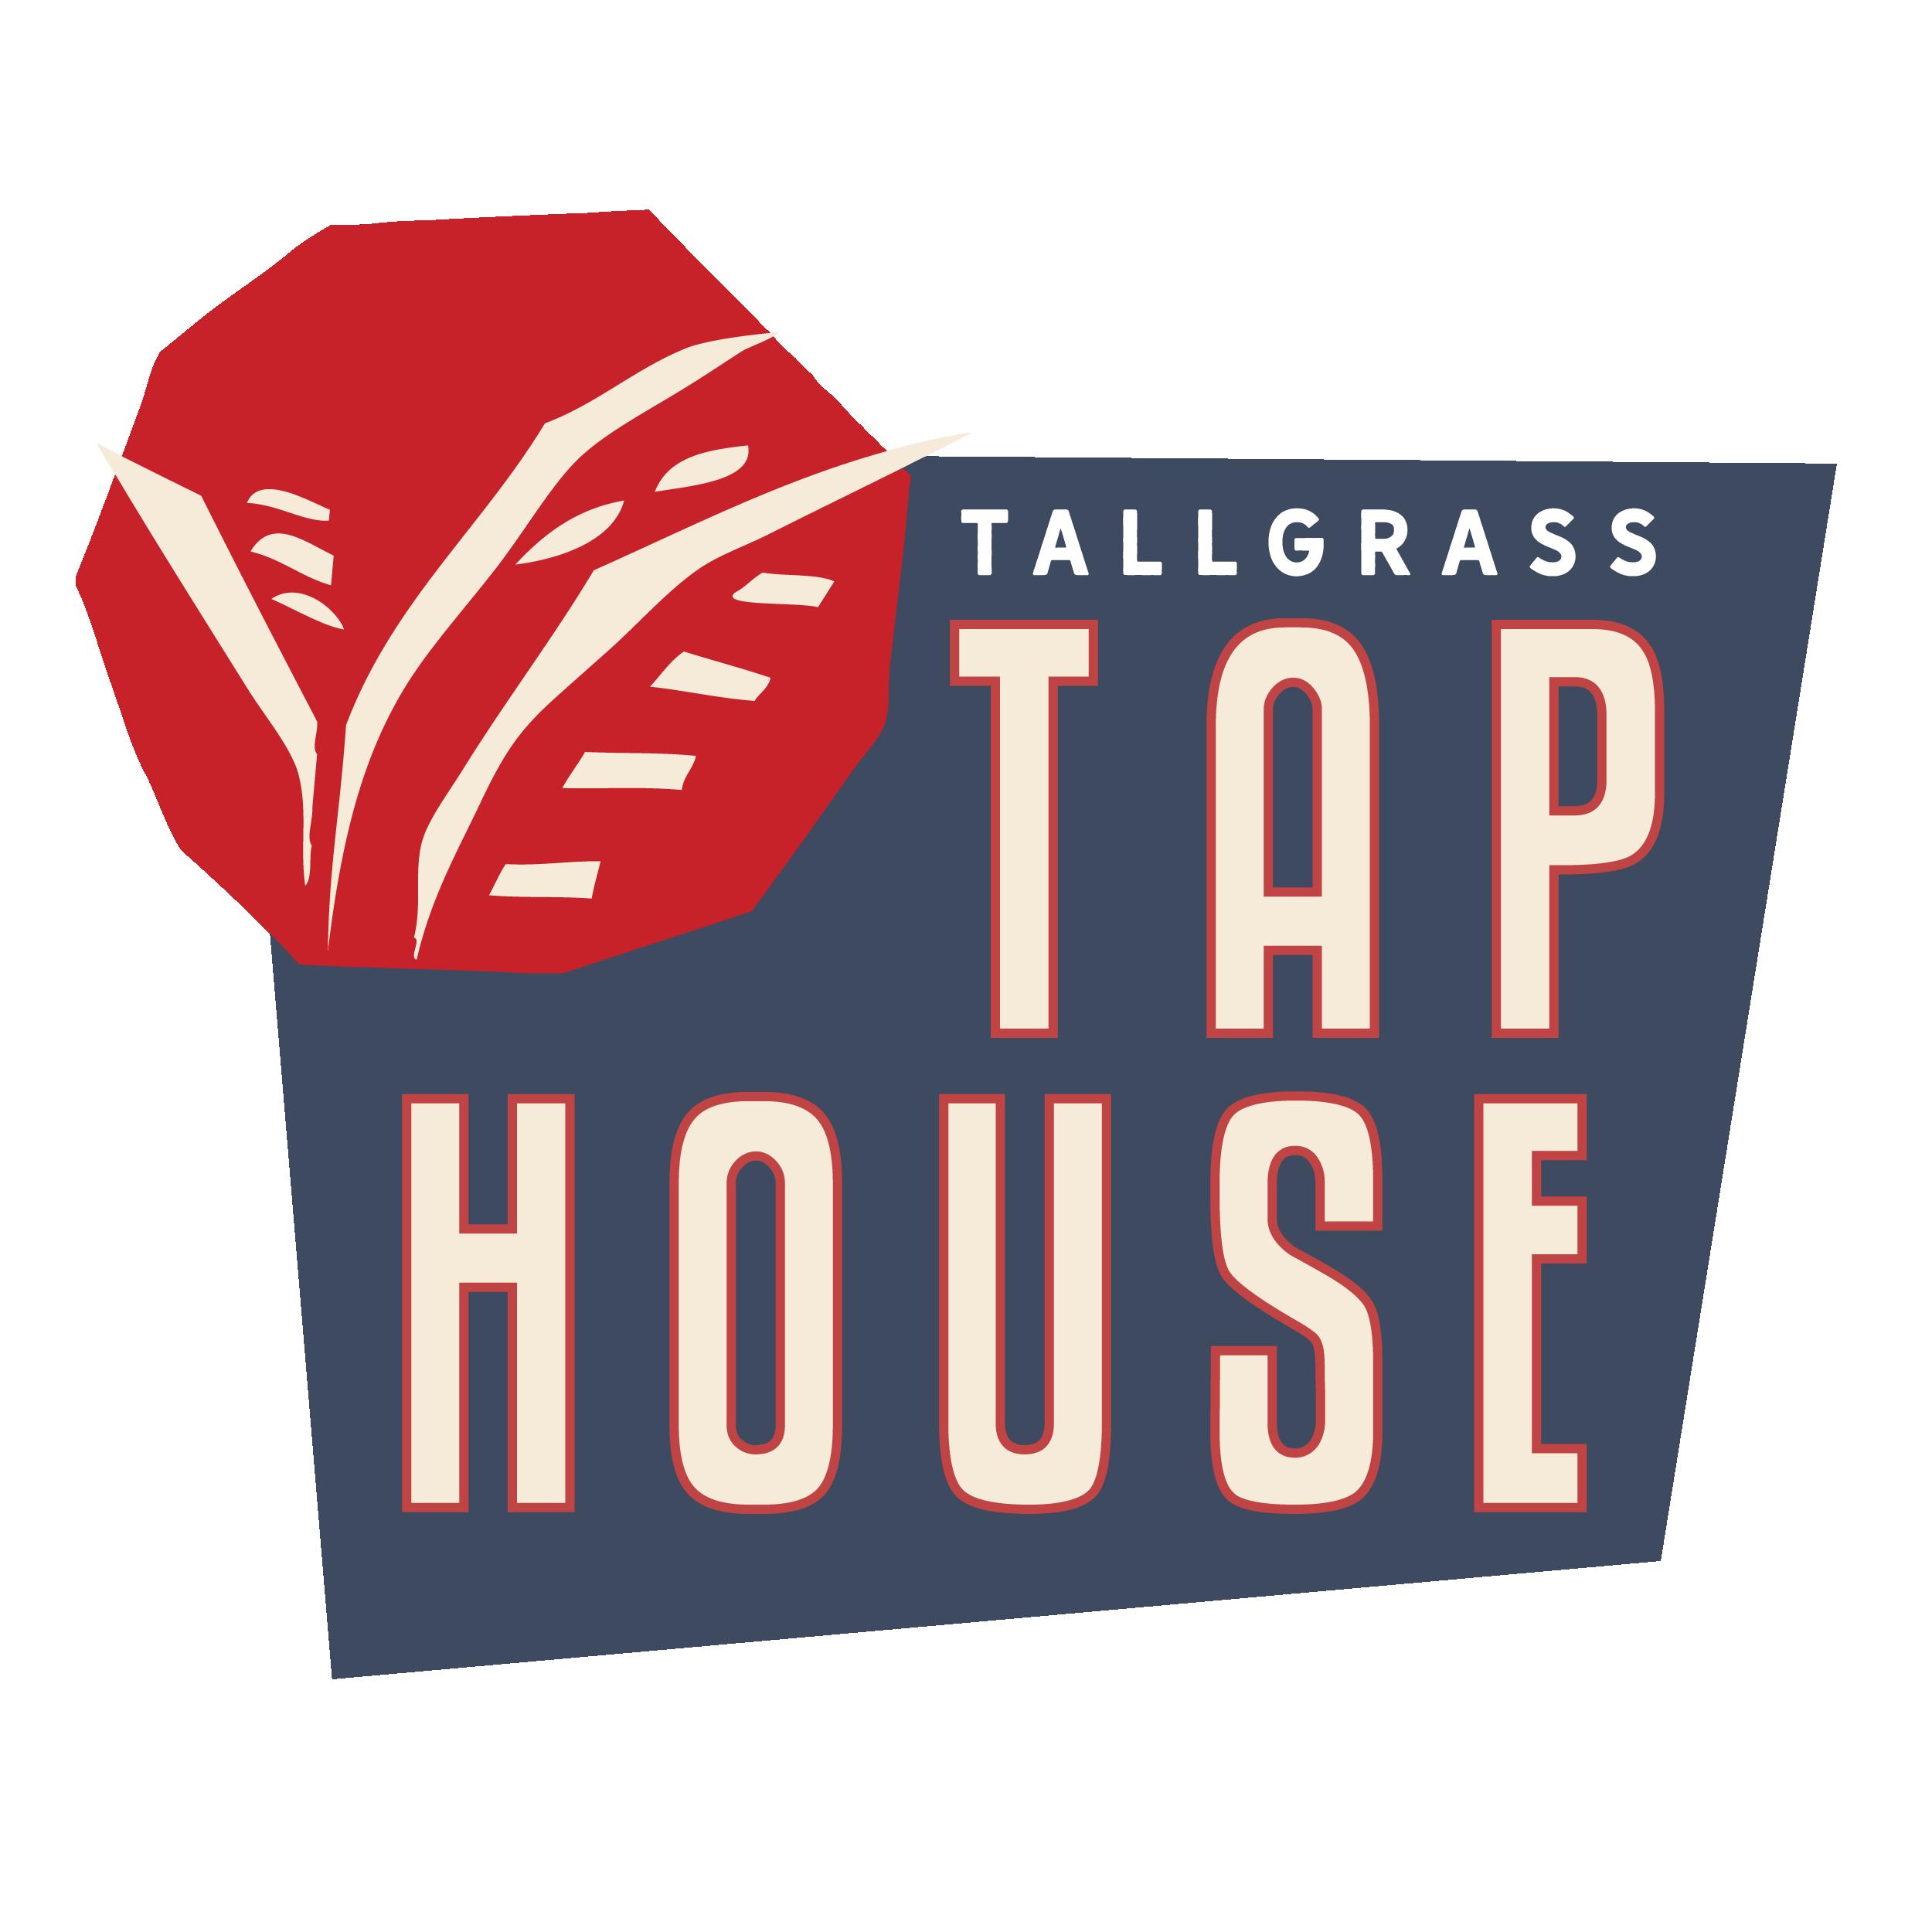 Tallgrass Tap House | Manhattan, KS